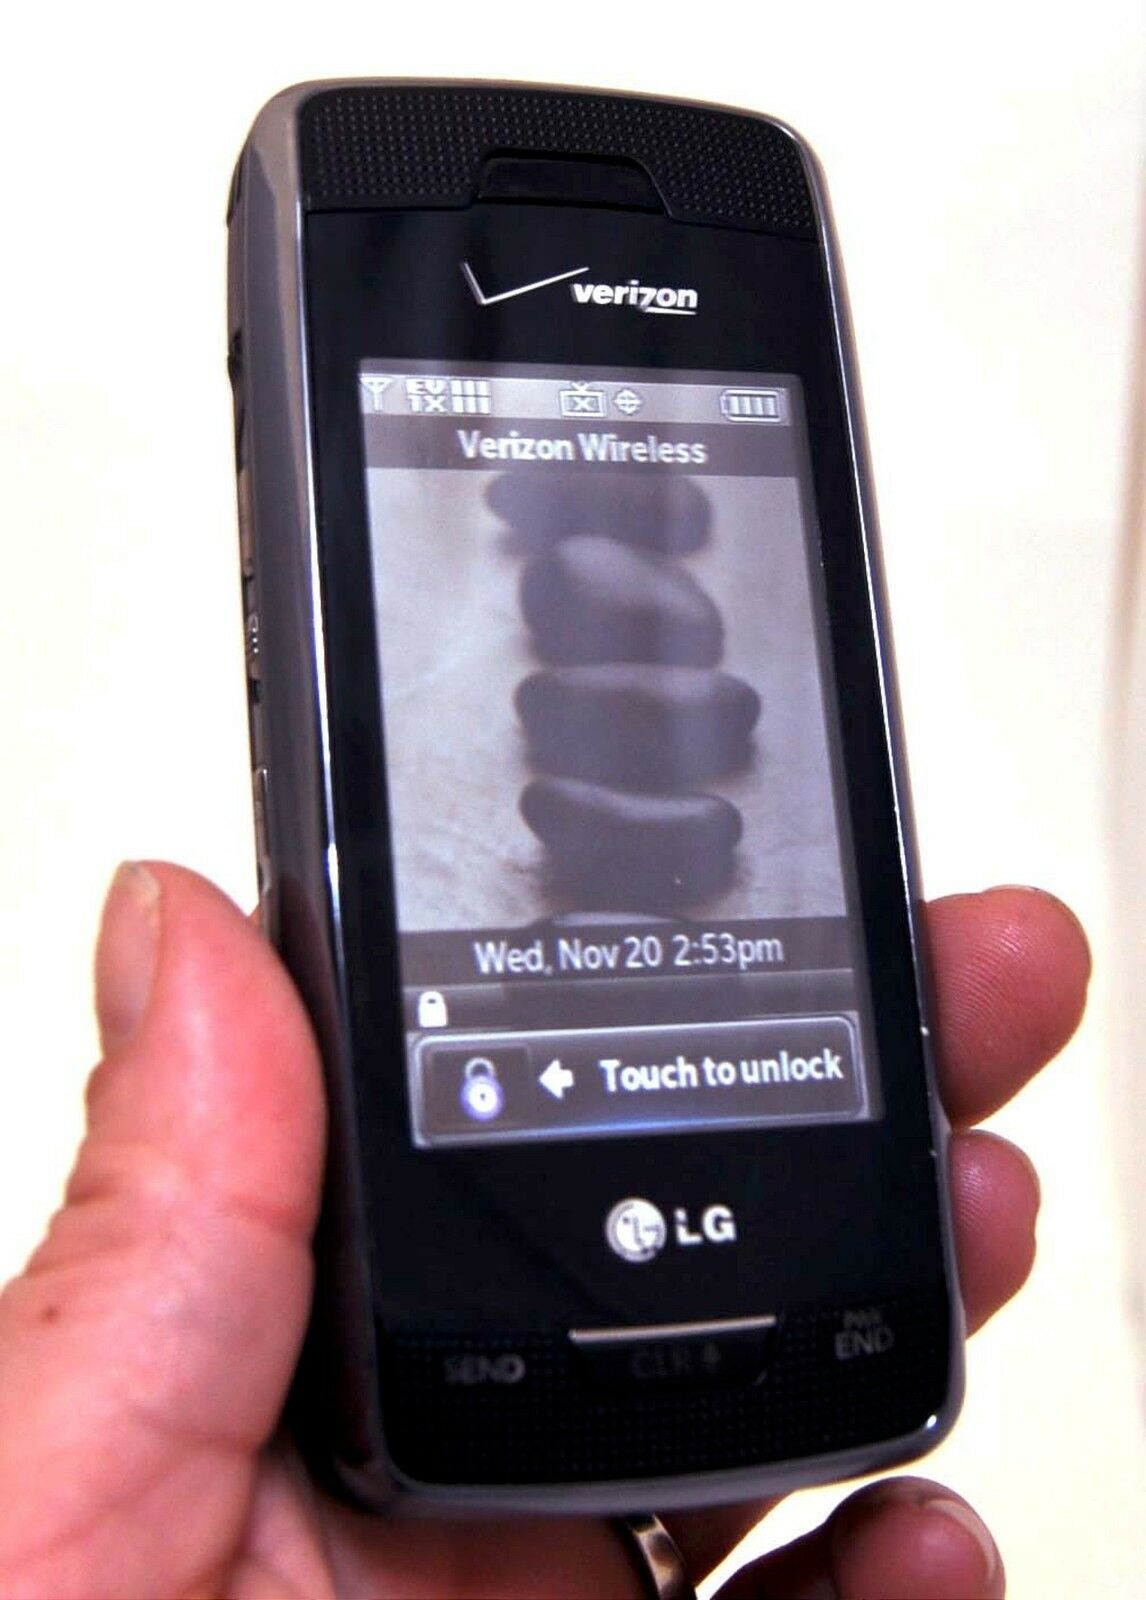 lg voyager vx10000 verizon phone black video camera vcast bluetooth rh ebay com LG Owner's Manual Verizon LG Phone Owners Manual